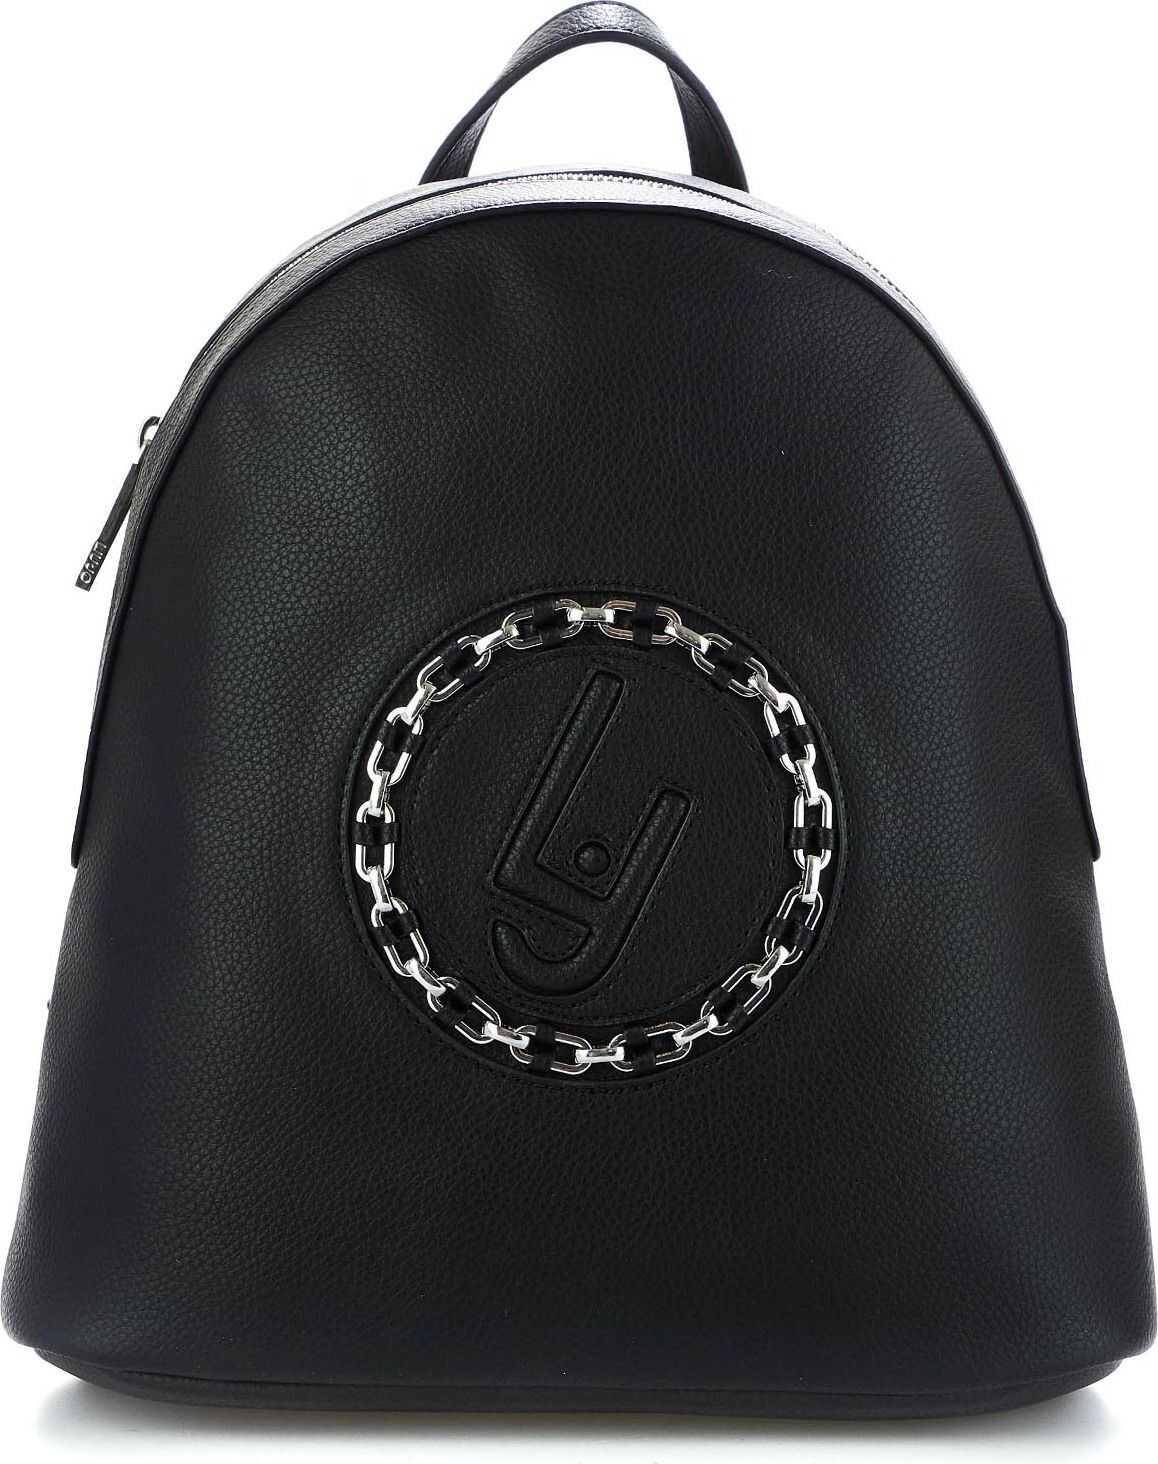 Liu Jo Backpack with logo detail Black